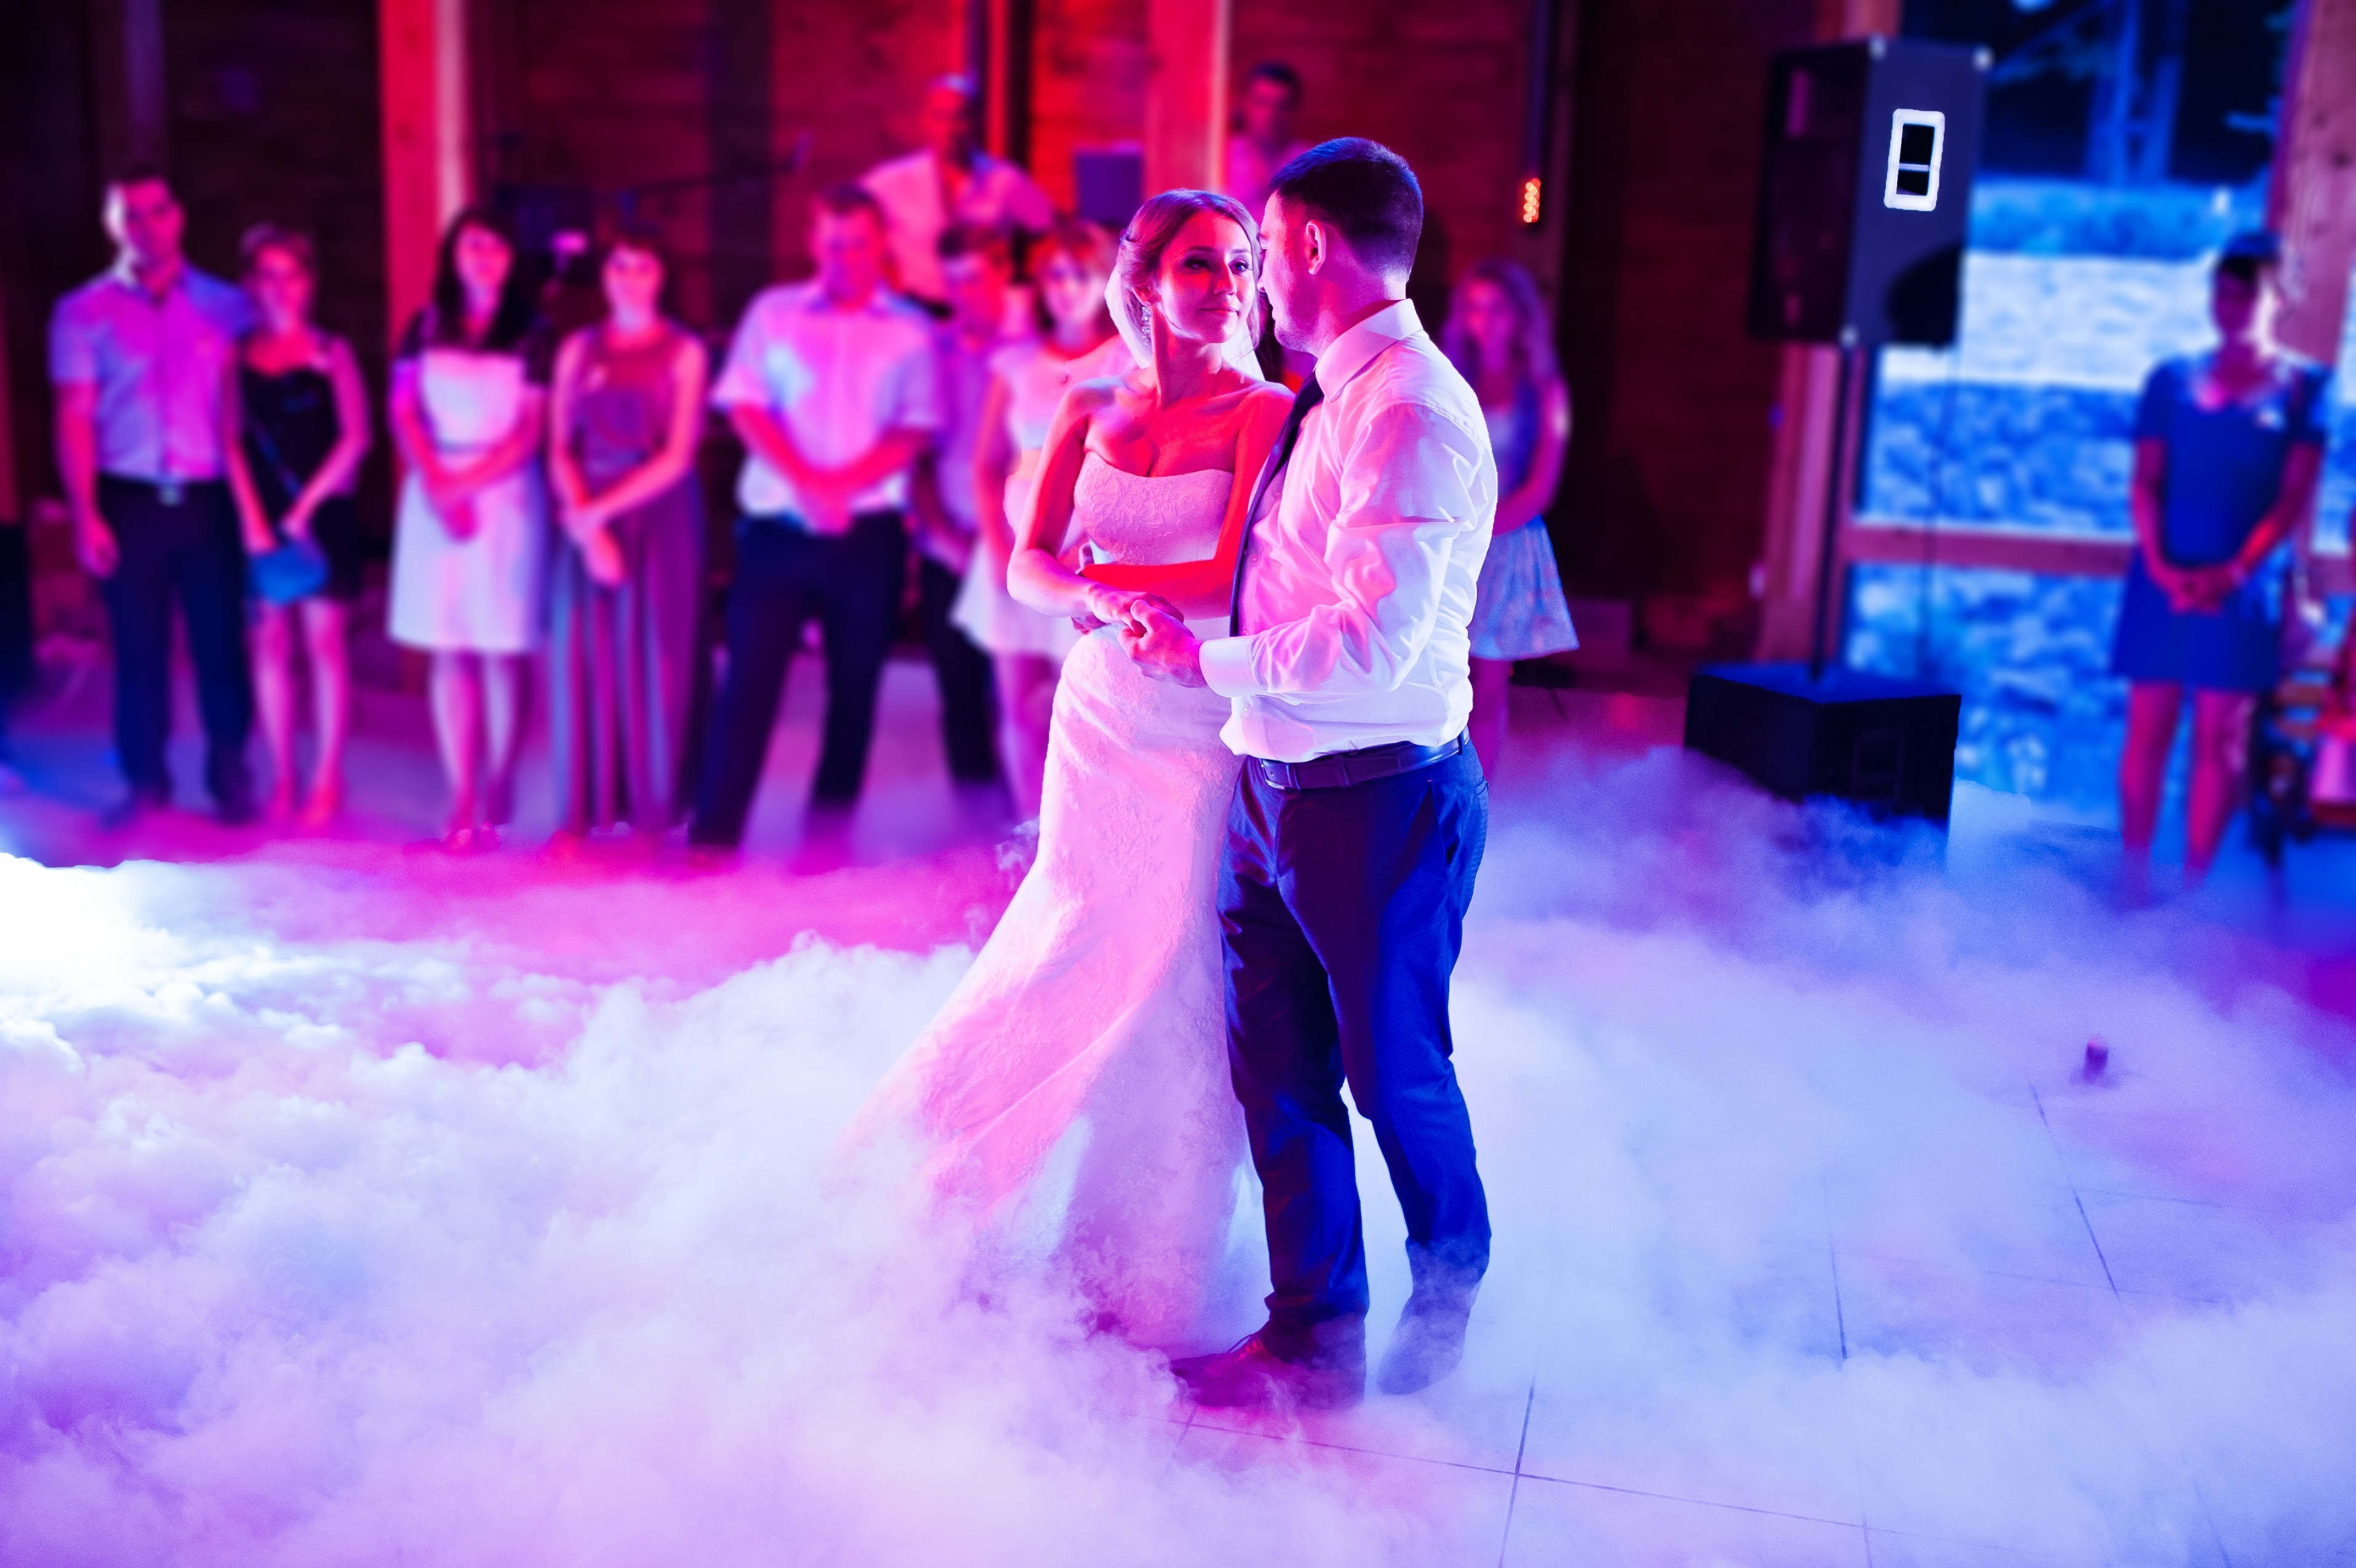 Wedding DJ service in Wilmington NC